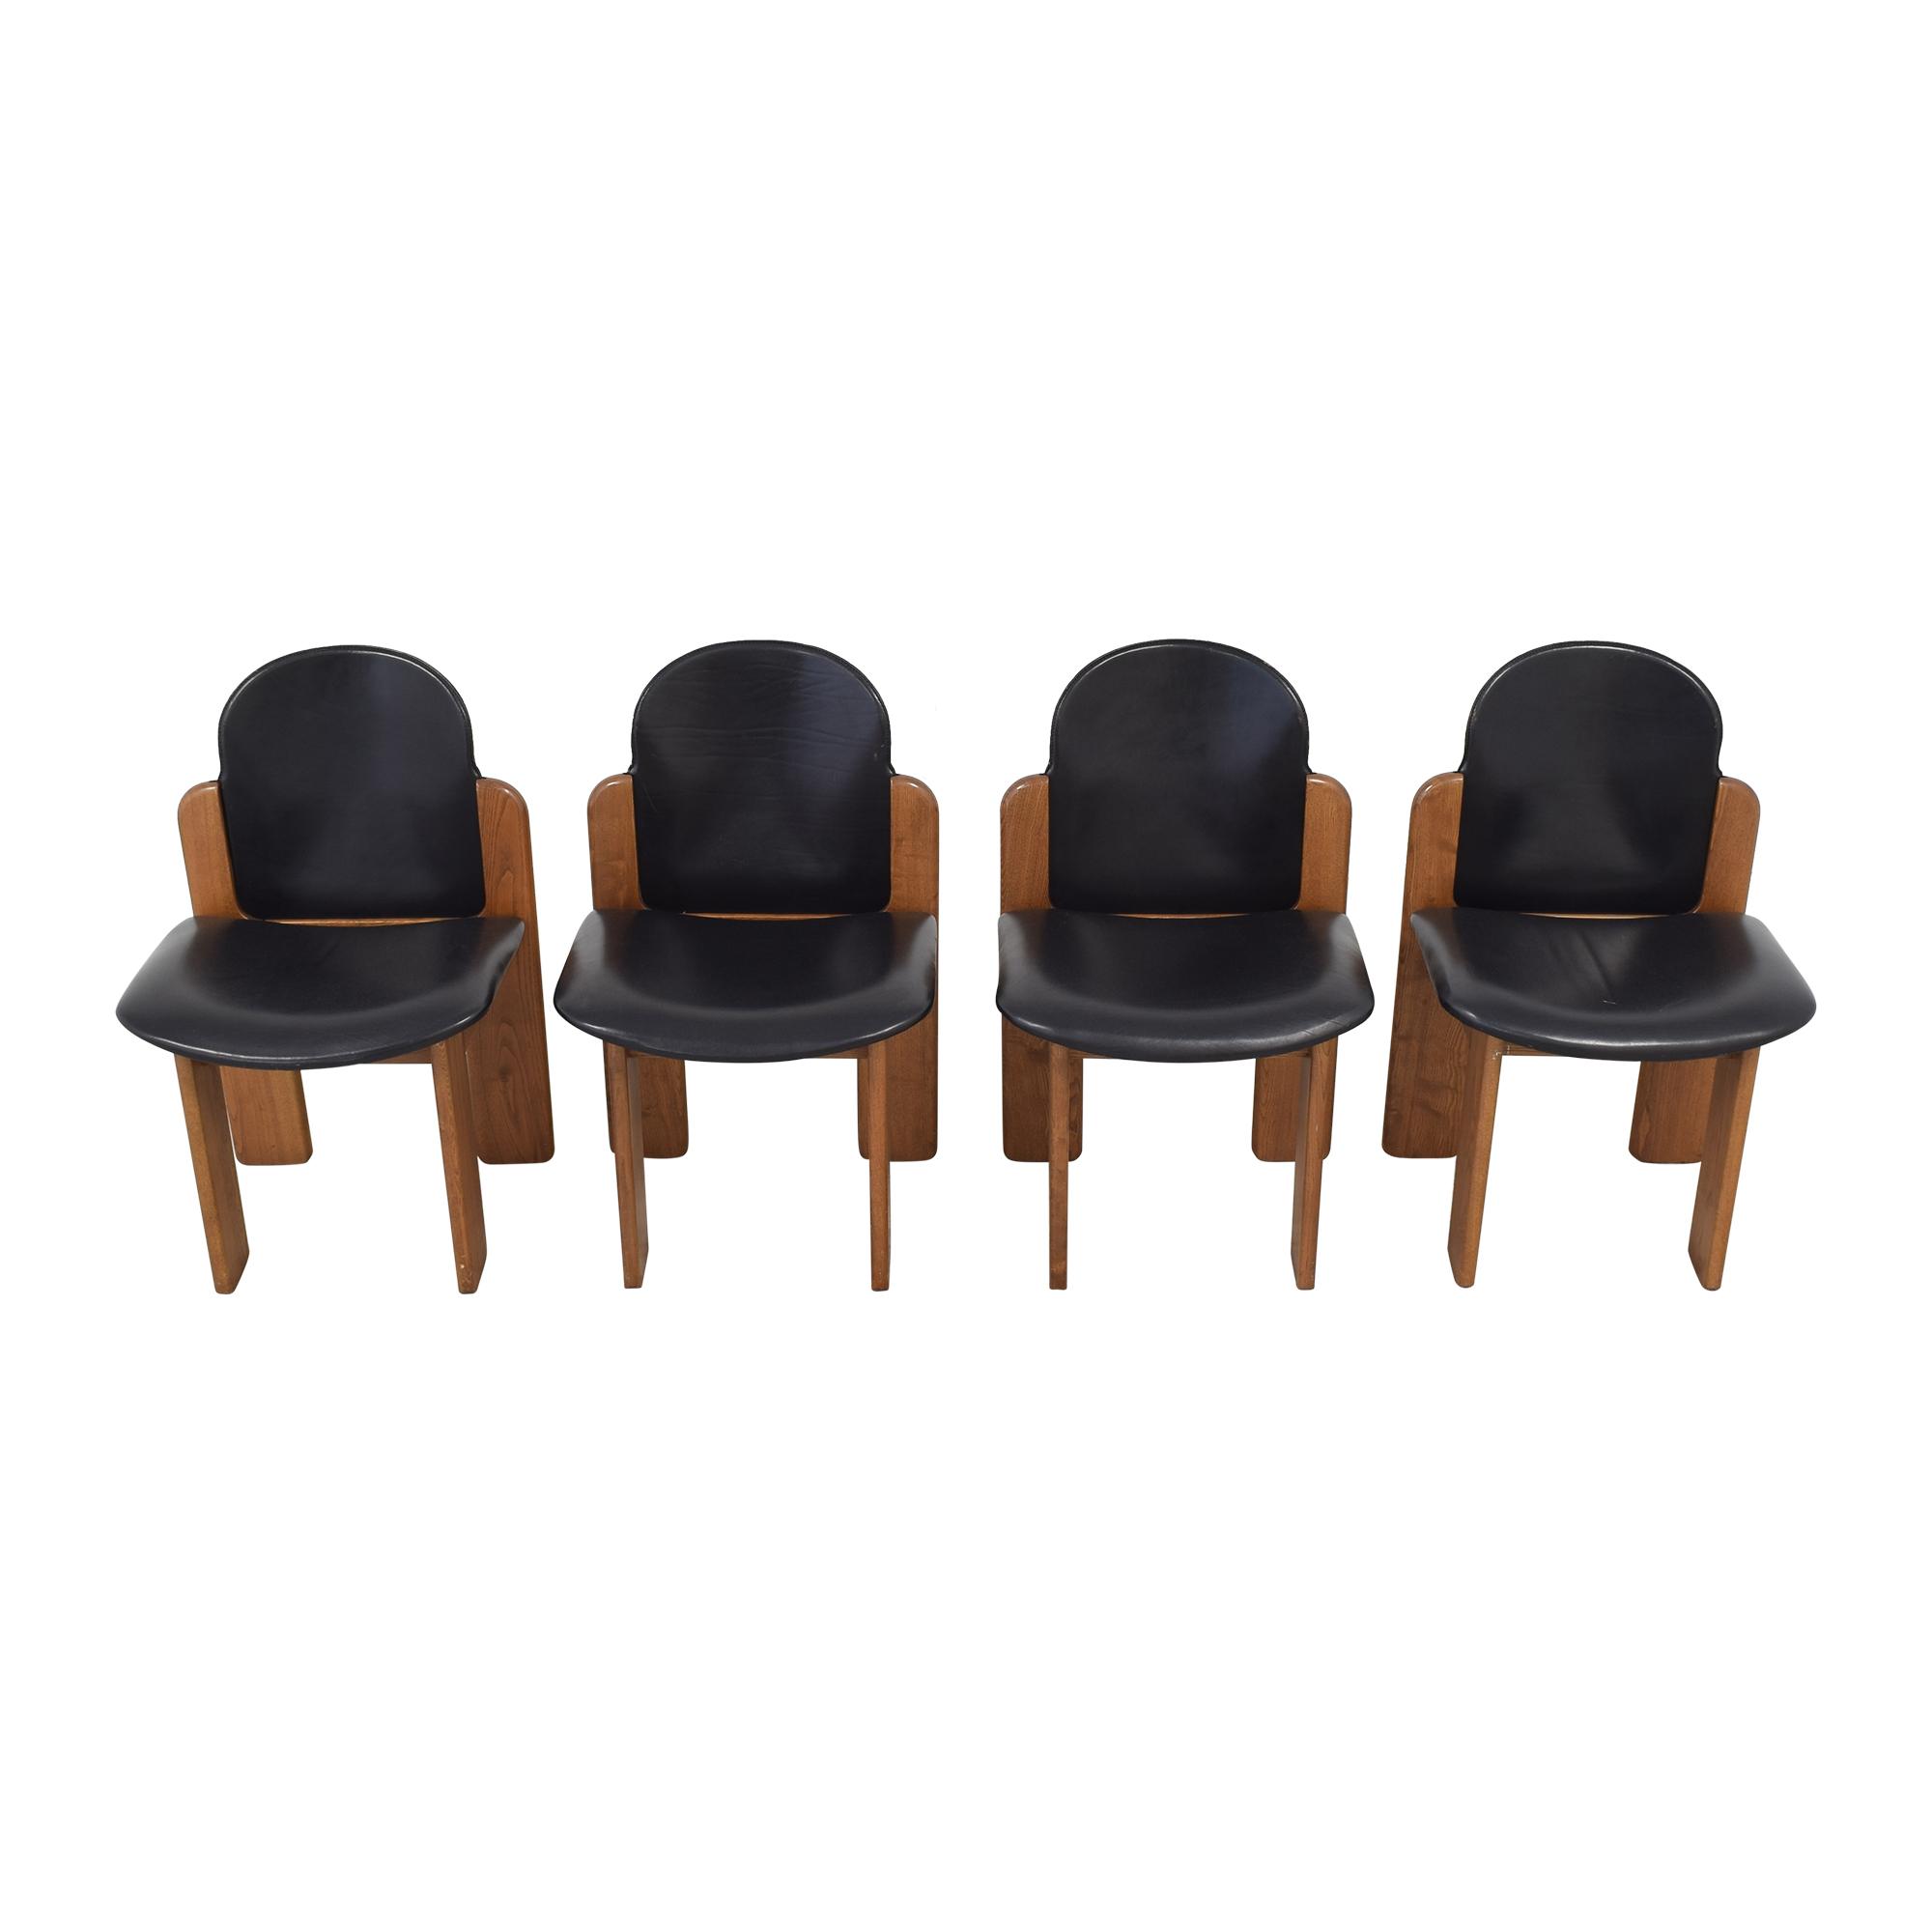 Fratelli Montina Fratelli Montina Italian Dining Chairs black & brown